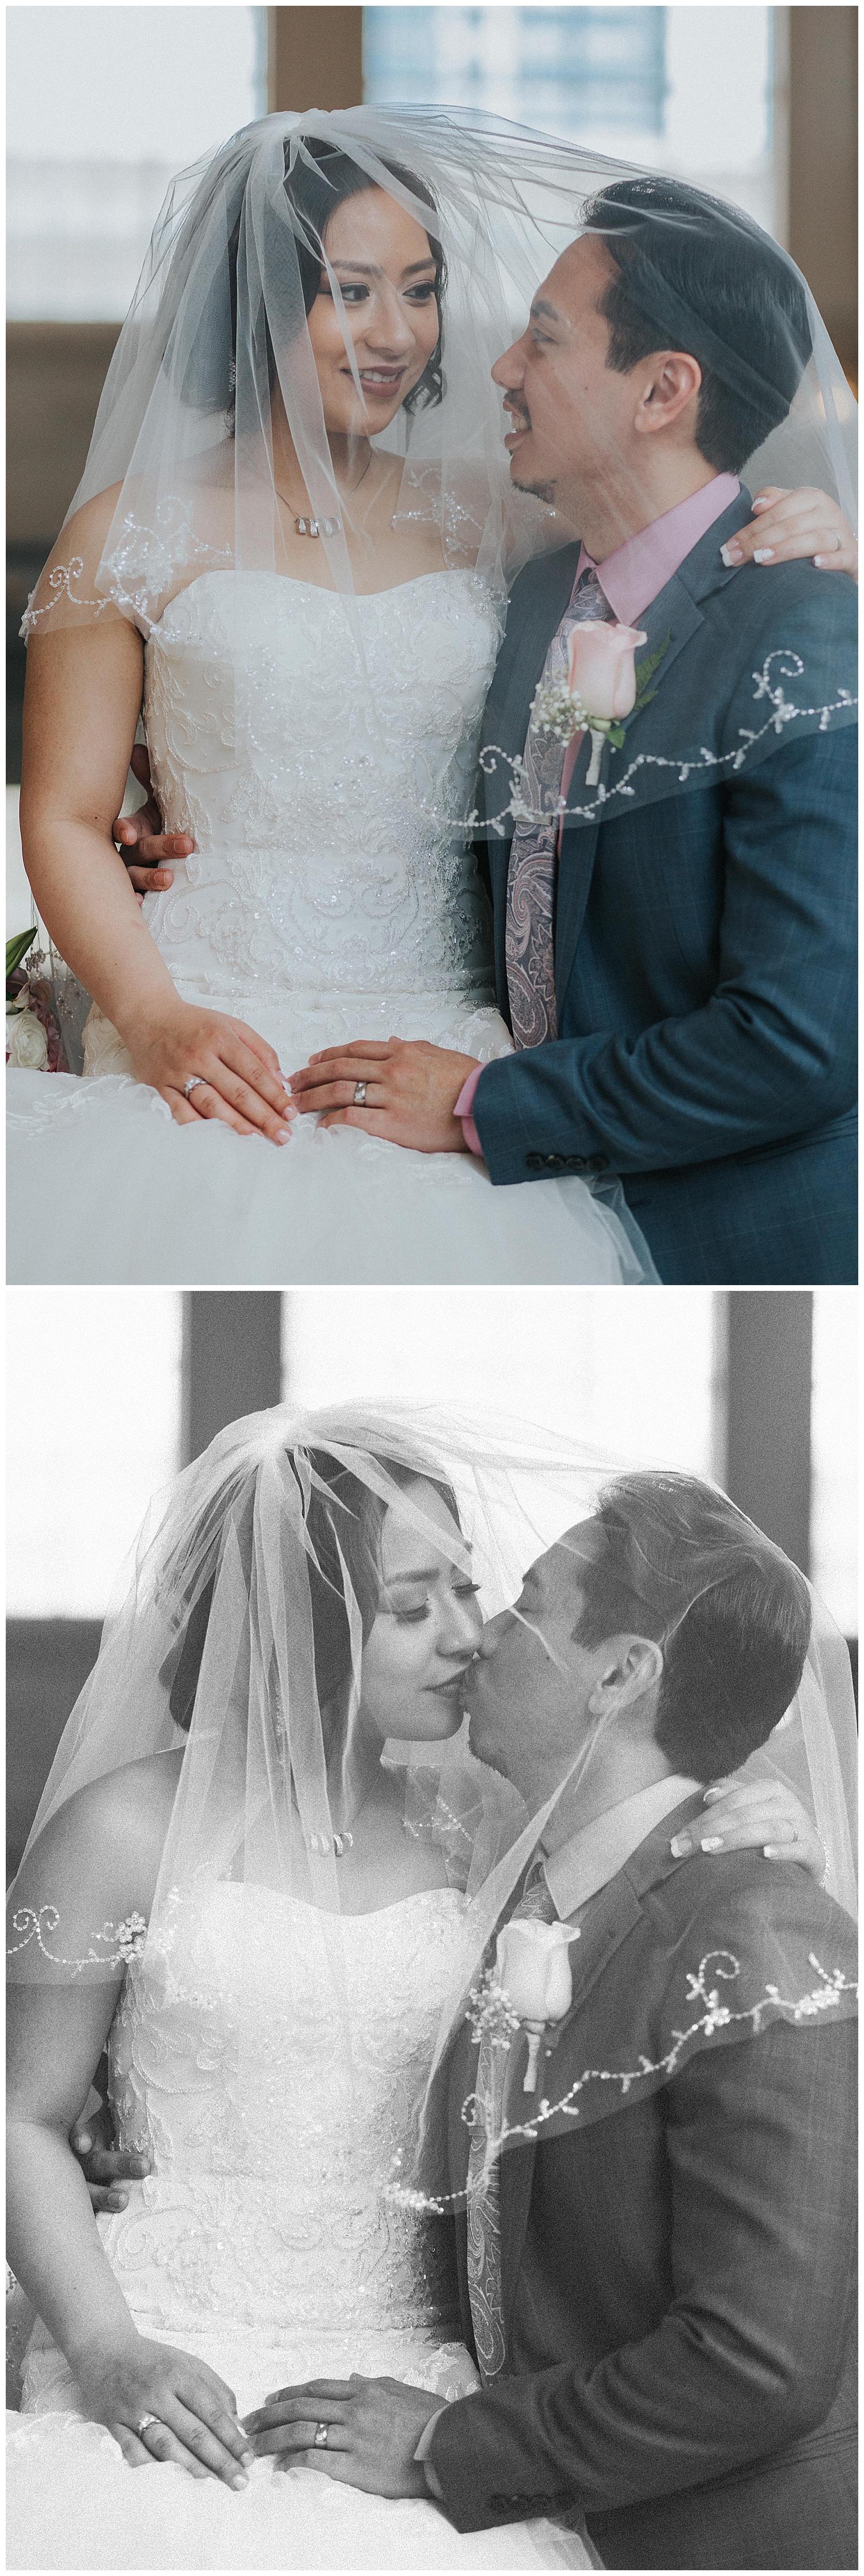 khariza-rae-photography-bay-area-wedding-photographer_0112.jpg